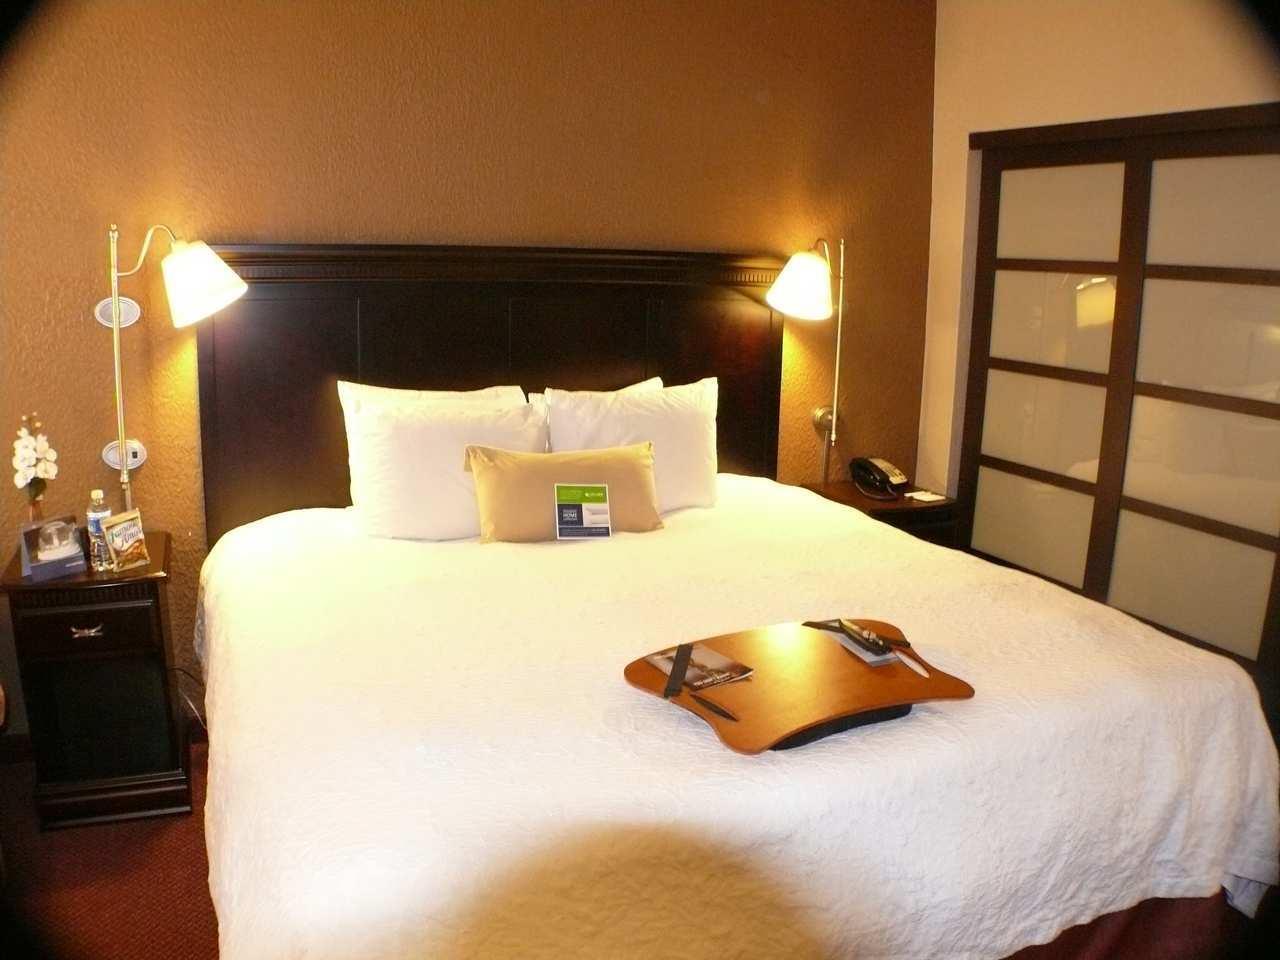 Hampton Inn & Suites Chicago/Hoffman Estates image 11